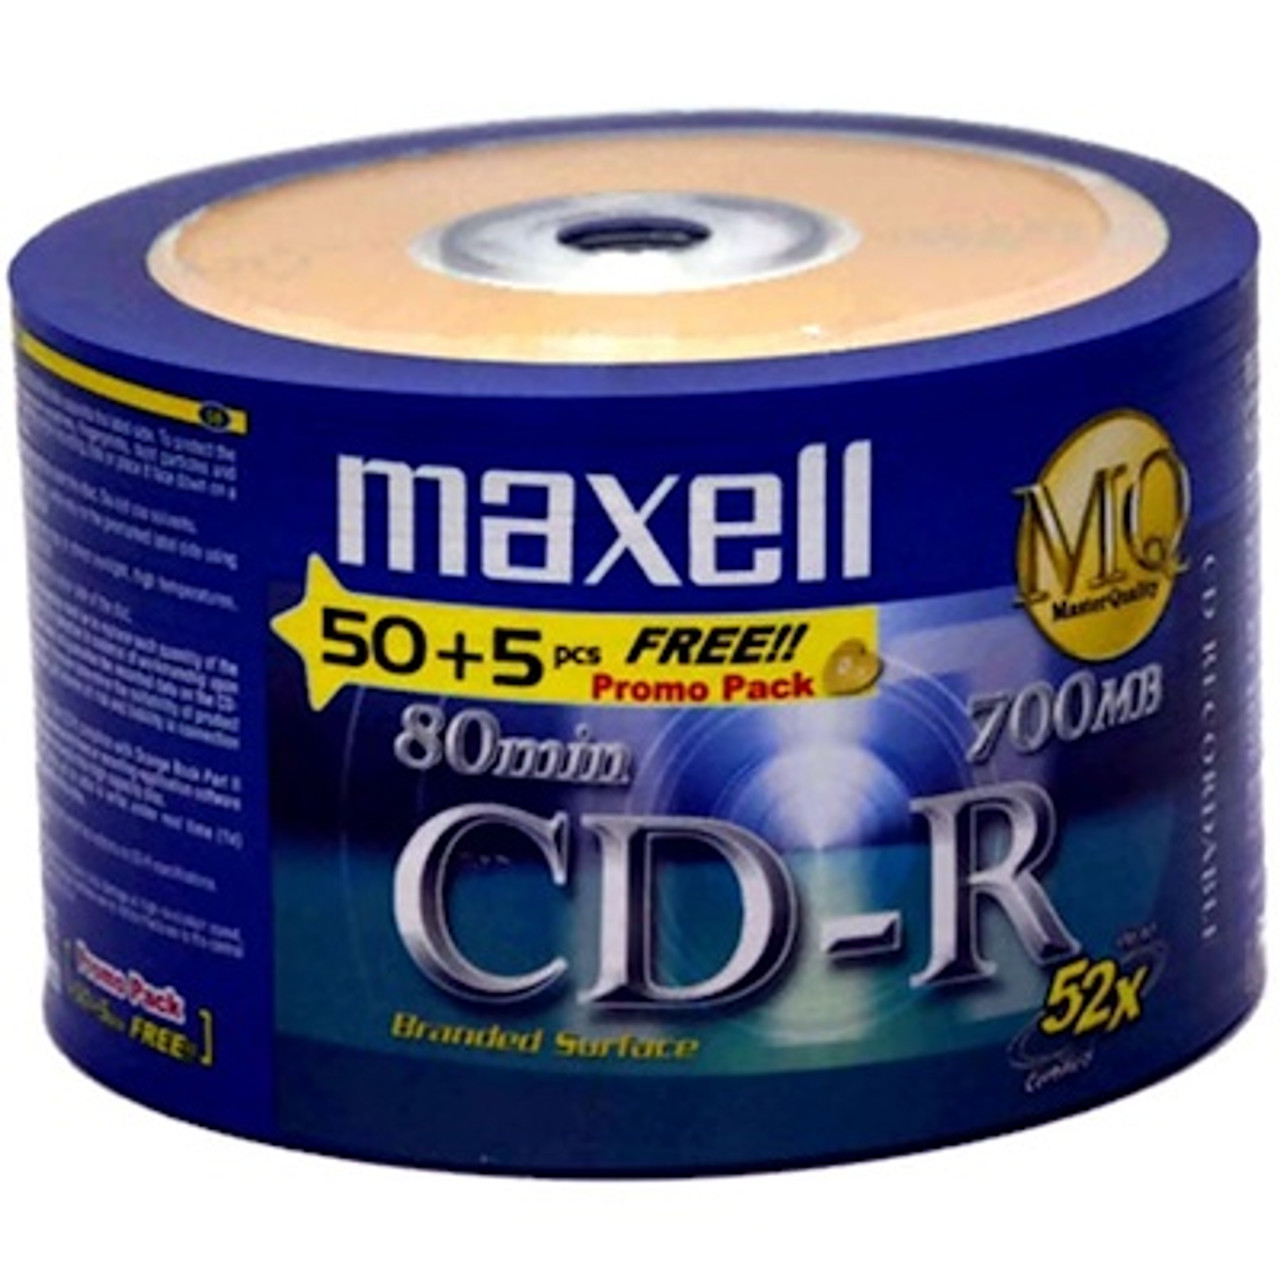 Maxell CD-R(50+5B) 52X 700mb 80min 50pcs Free 5pcs Bulk Pack